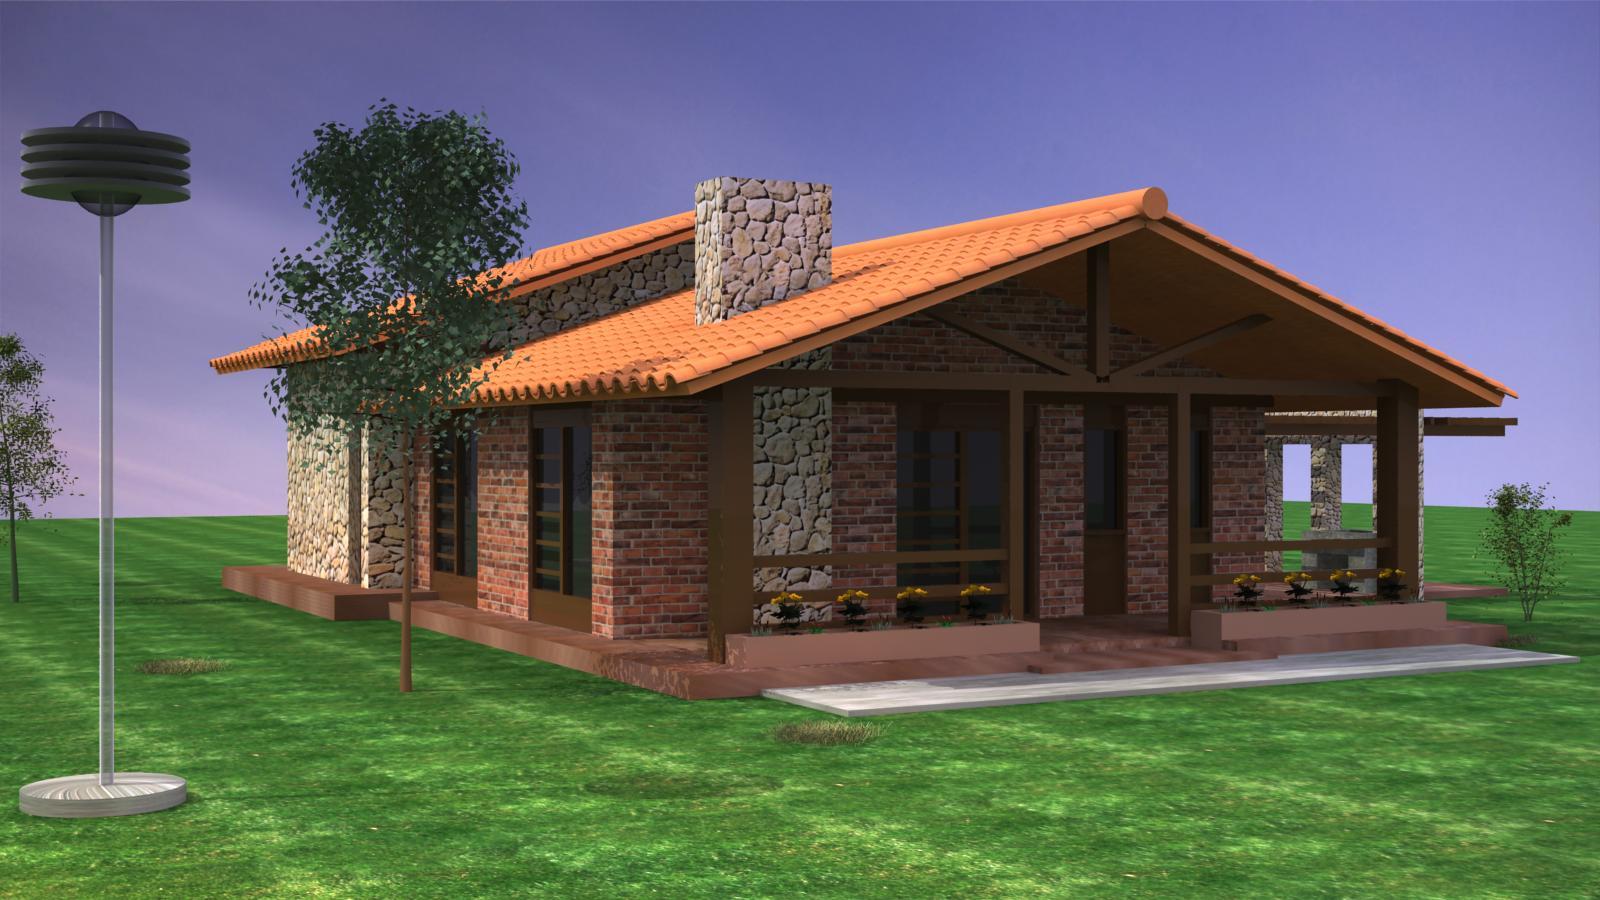 Lost studio casas de campo for Planos de casas de campo modernas